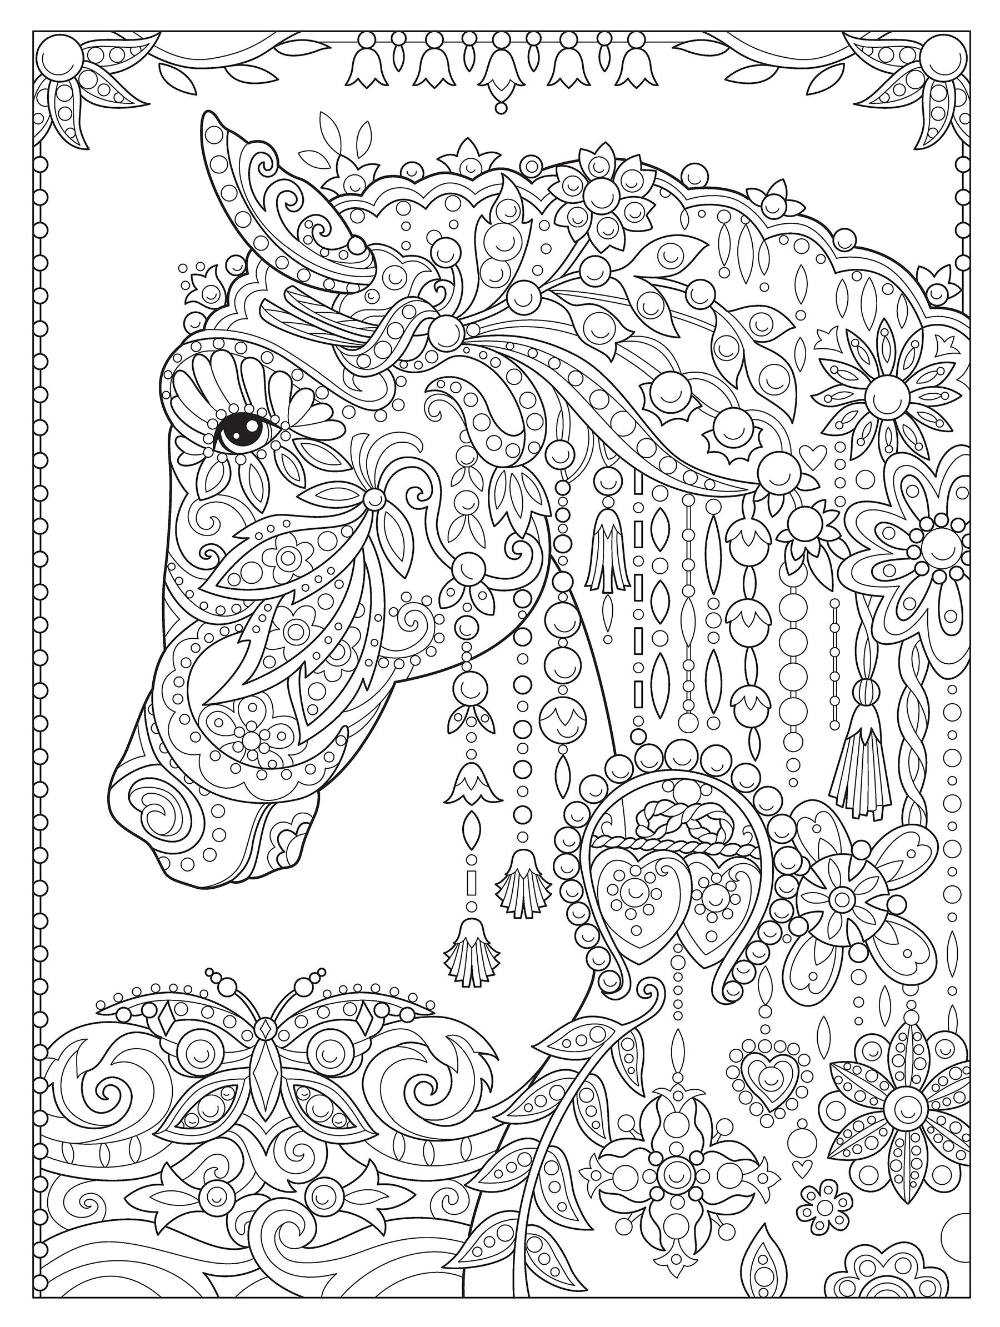 Amazon Com Creative Haven Dream Horses Coloring Book Creative Haven Coloring Books 9780486 Horse Coloring Pages Pattern Coloring Pages Horse Coloring Books